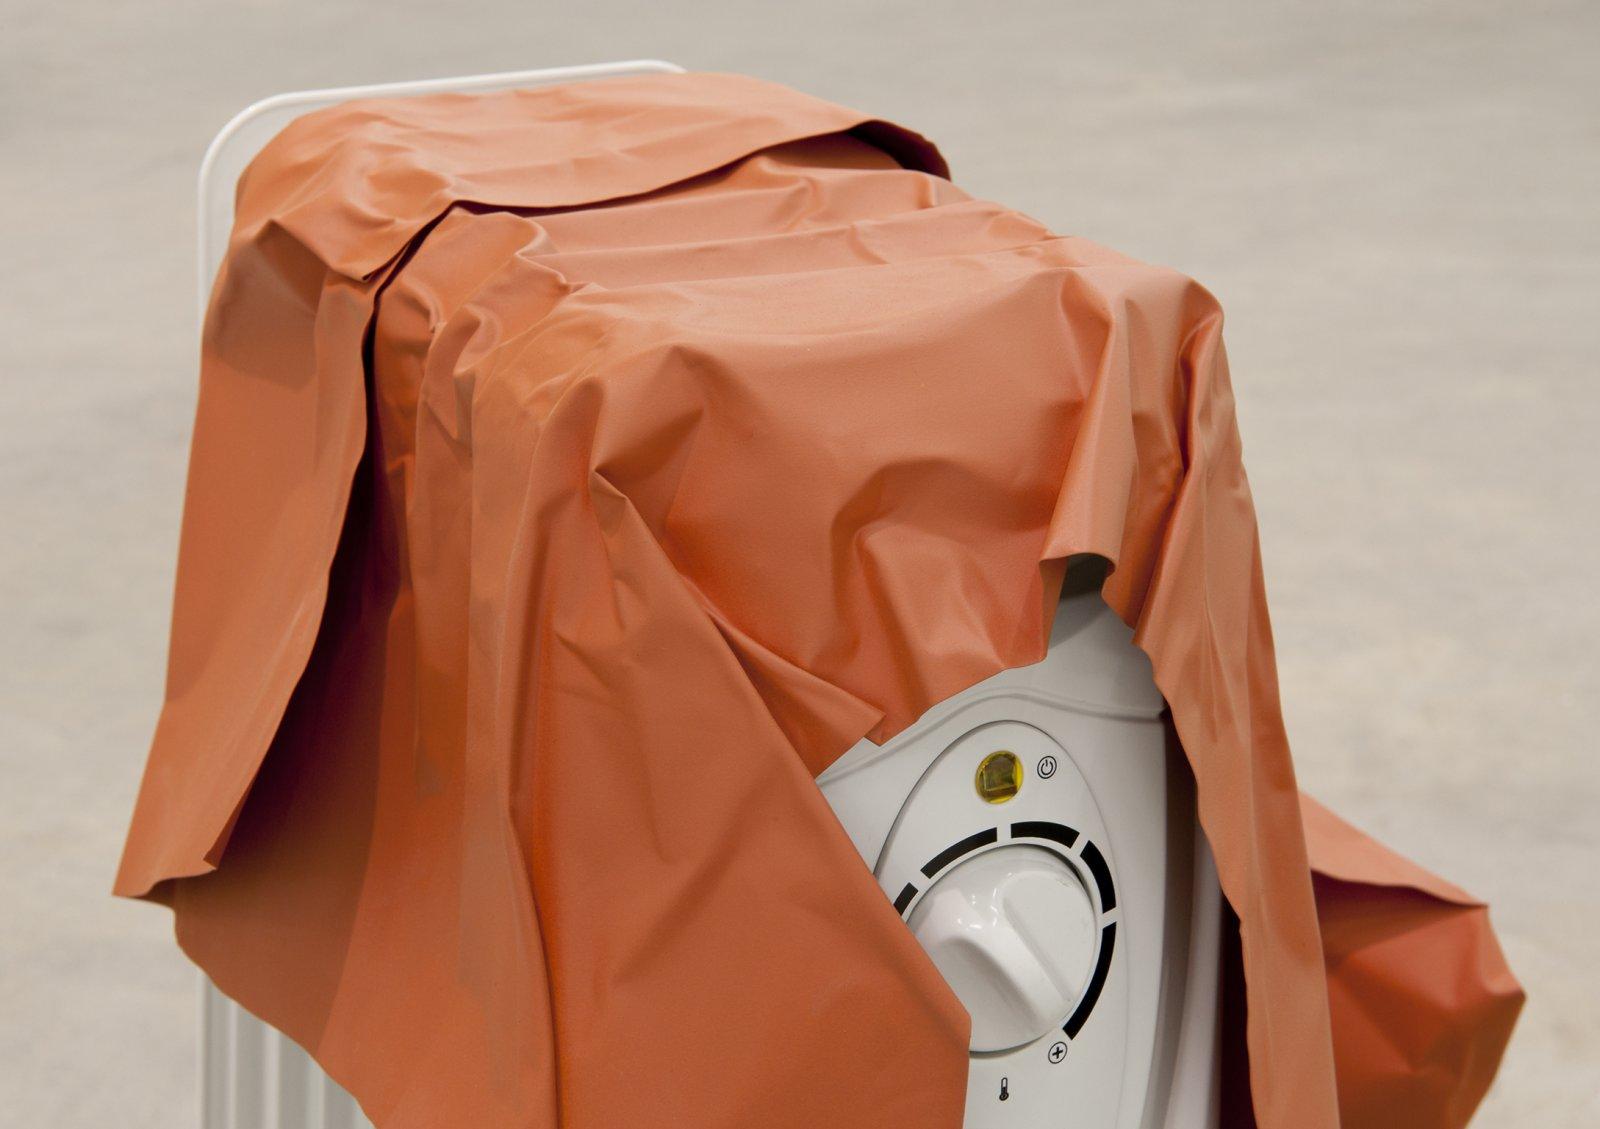 Judy Radul, Object Analysis Spectator Poem (Heater) (detail), 2012, painted copper, heater, colour photograph, heater: 26 x 15 x 11 in. (65 x 38 x 28 cm), photo: 8 x 11 x 5 in. (20 x 28 x 13 cm)  by Judy Radul